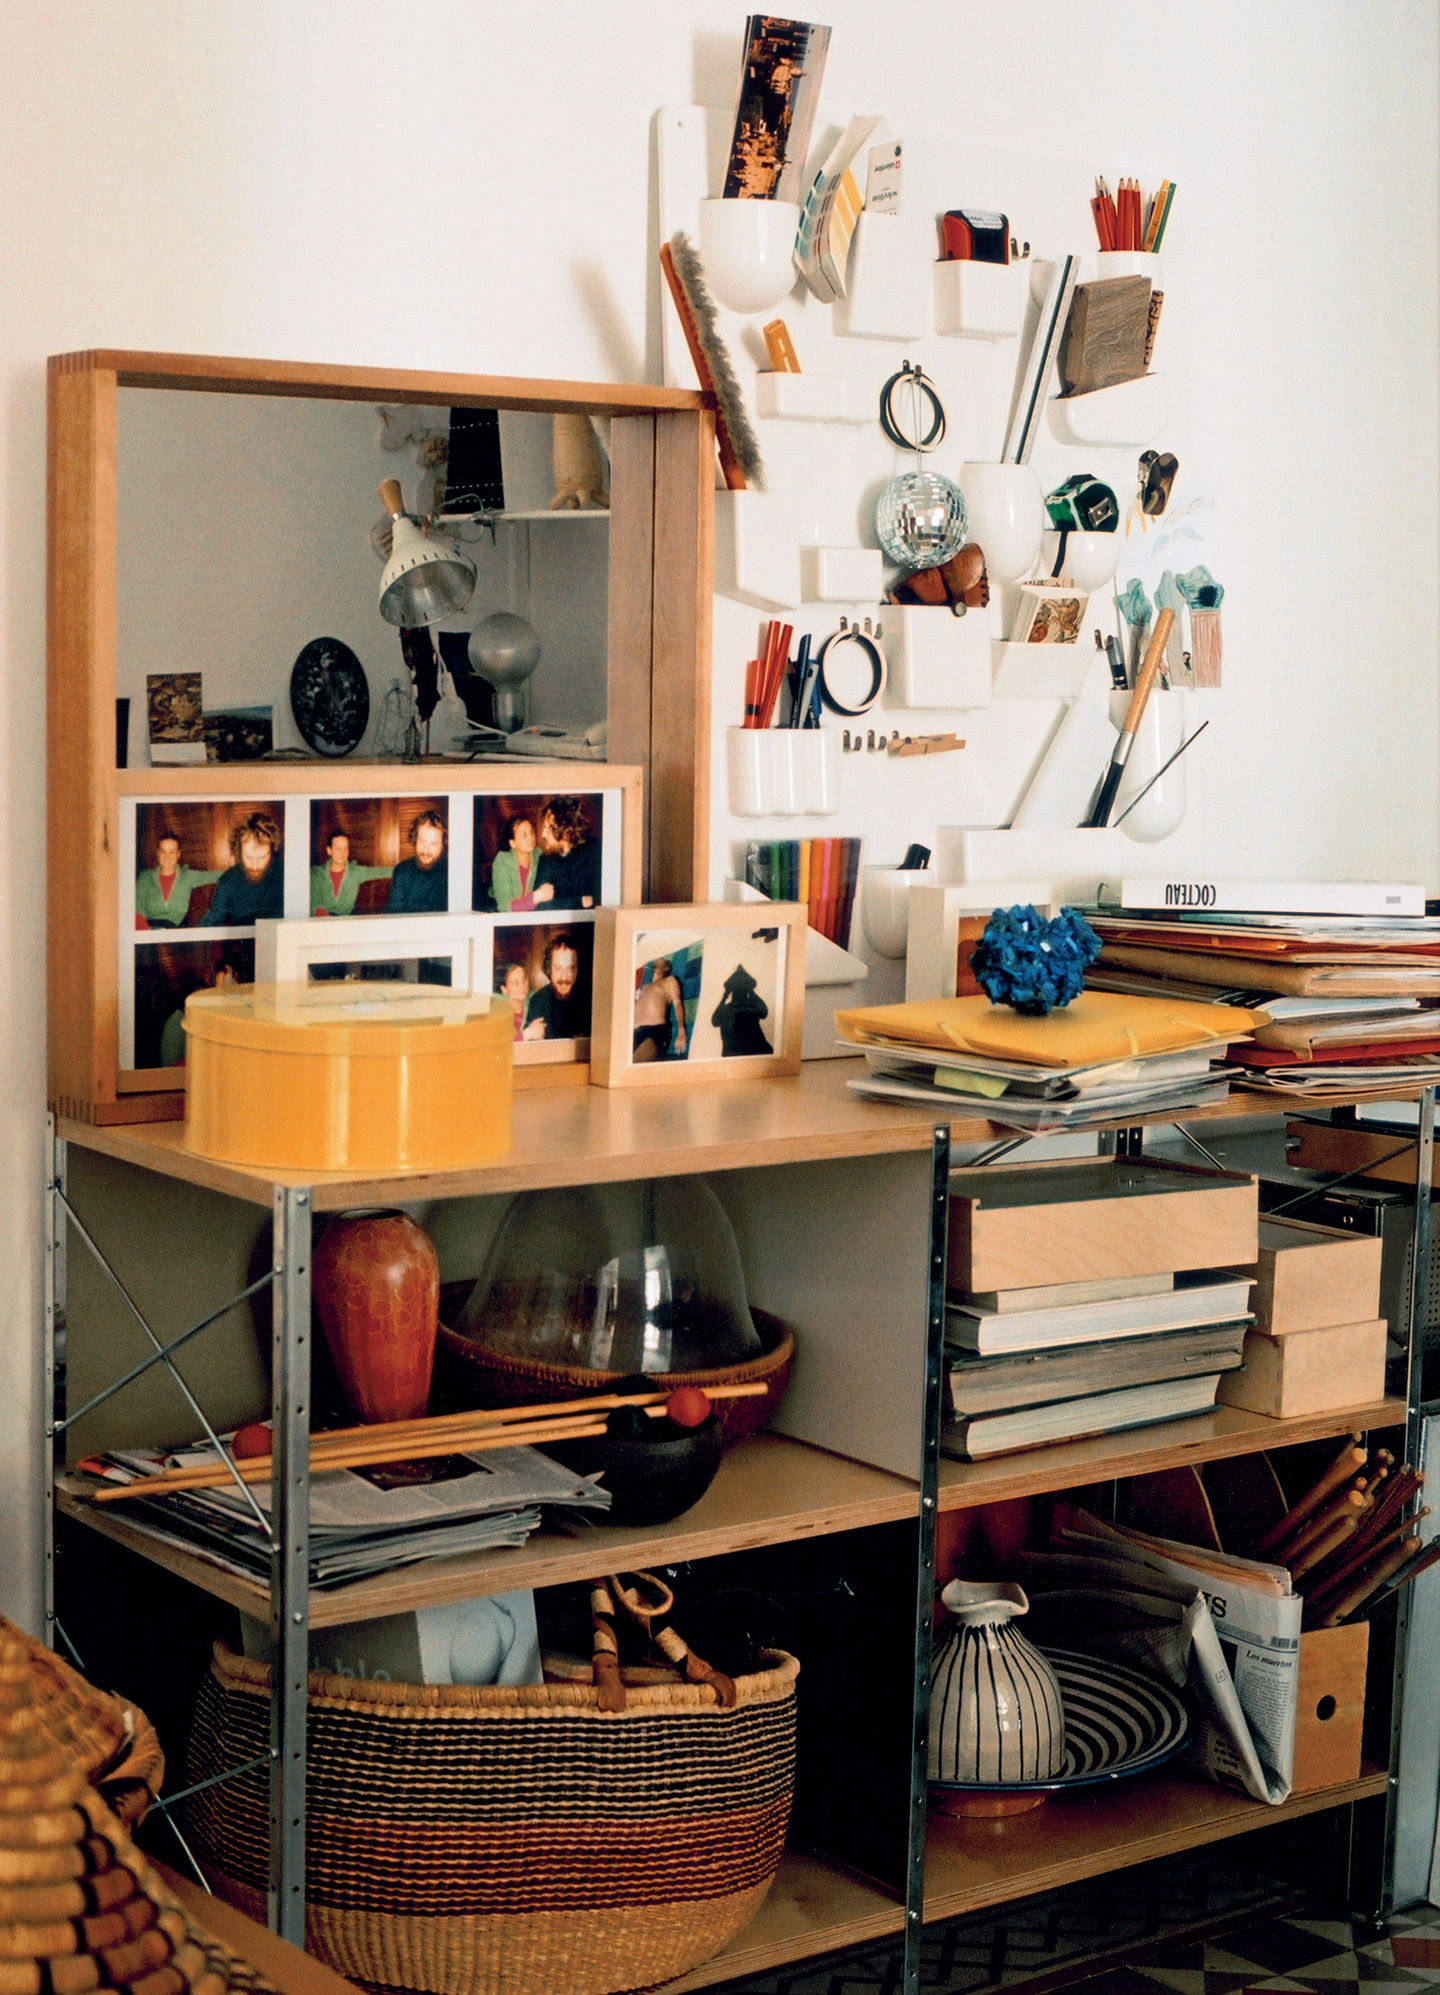 vitra uten silo. Black Bedroom Furniture Sets. Home Design Ideas